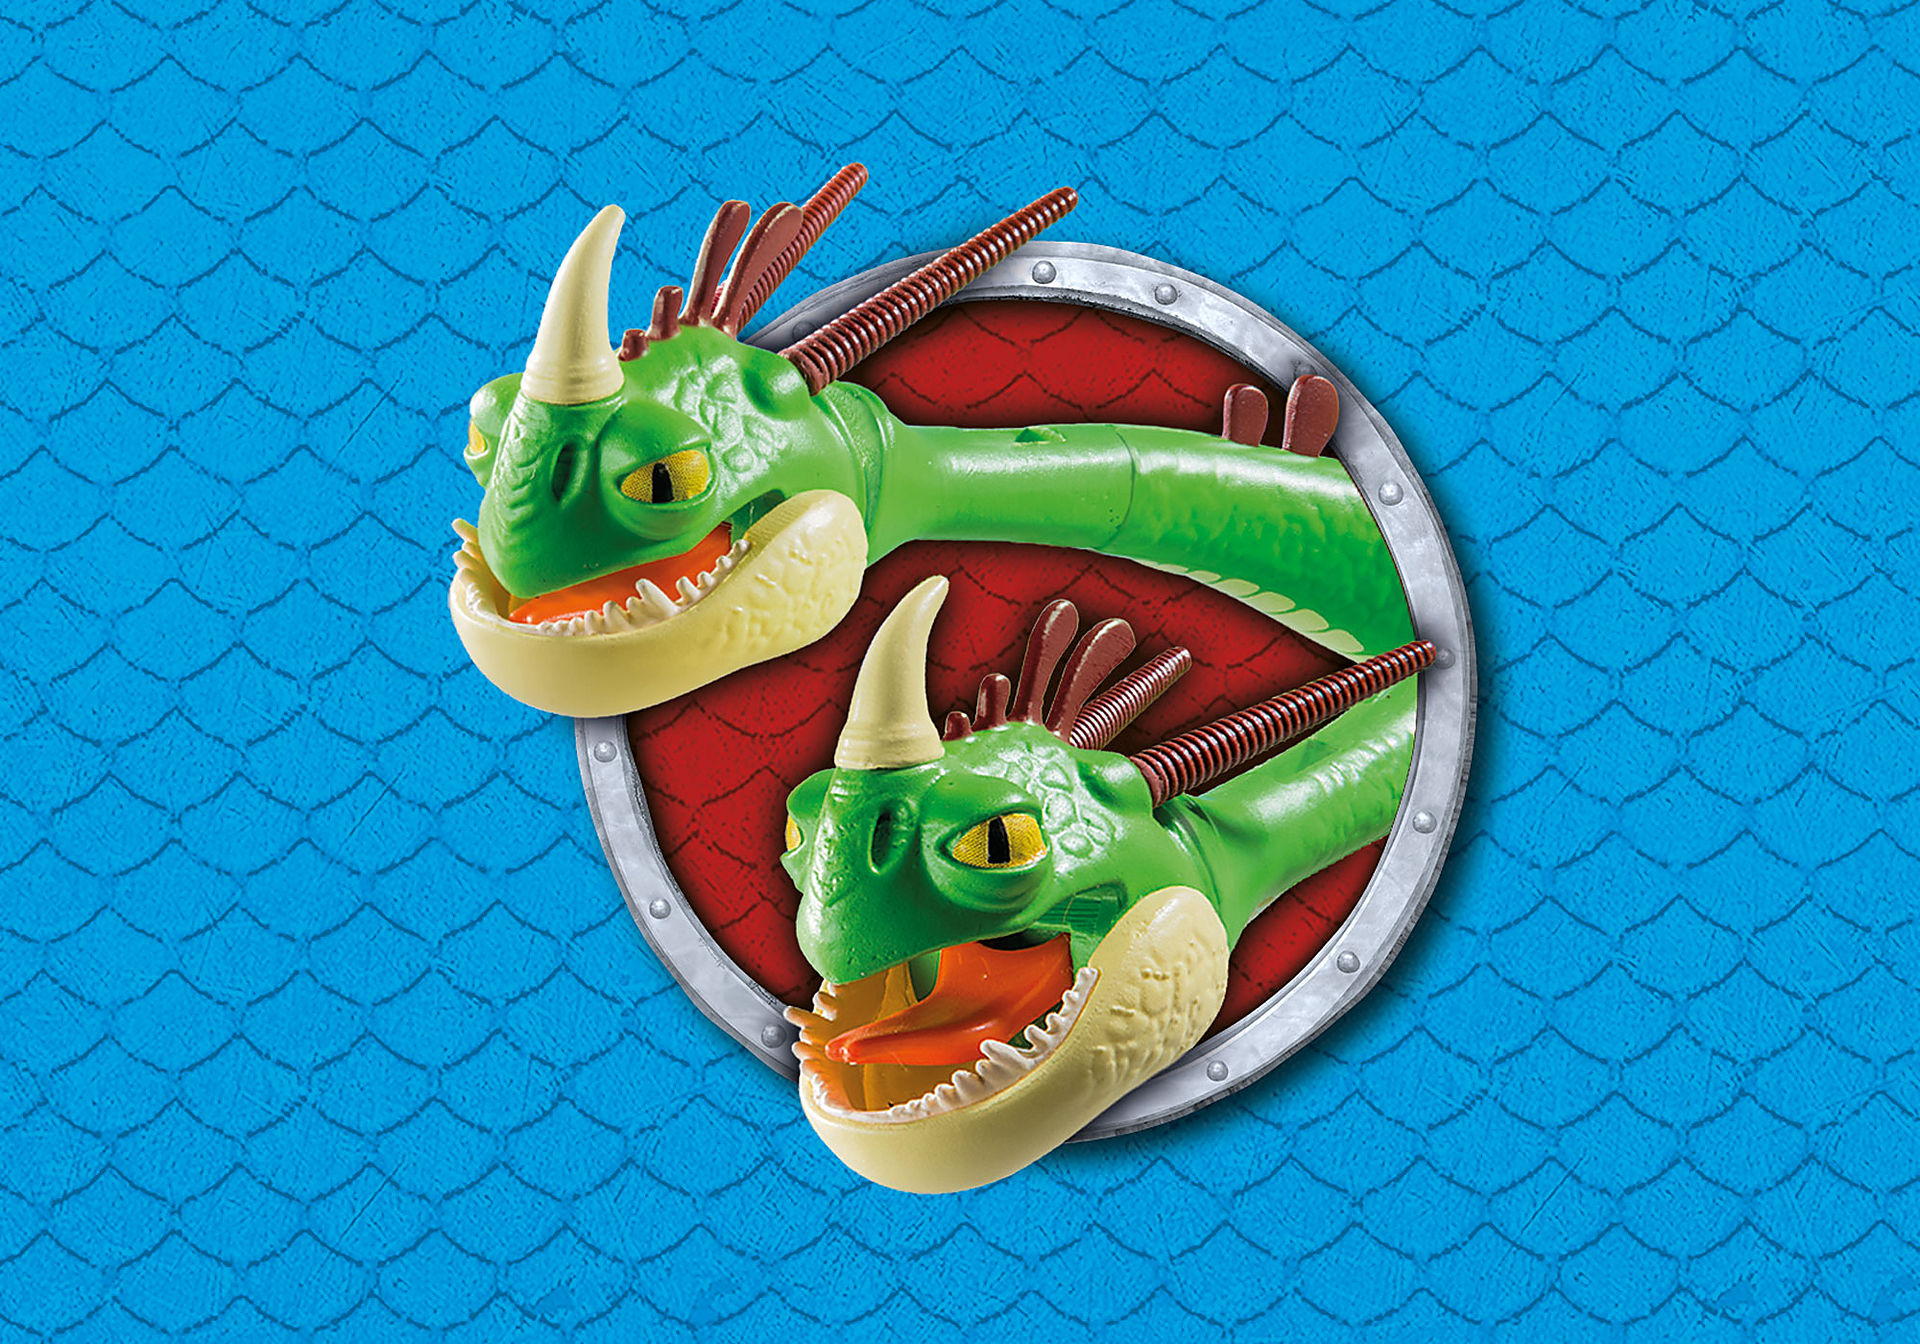 http://media.playmobil.com/i/playmobil/9458_product_extra4/Ο Πέτρας και η Πέτρα με τον δικέφαλο δράκο Ρέψιμο & Αναγούλα